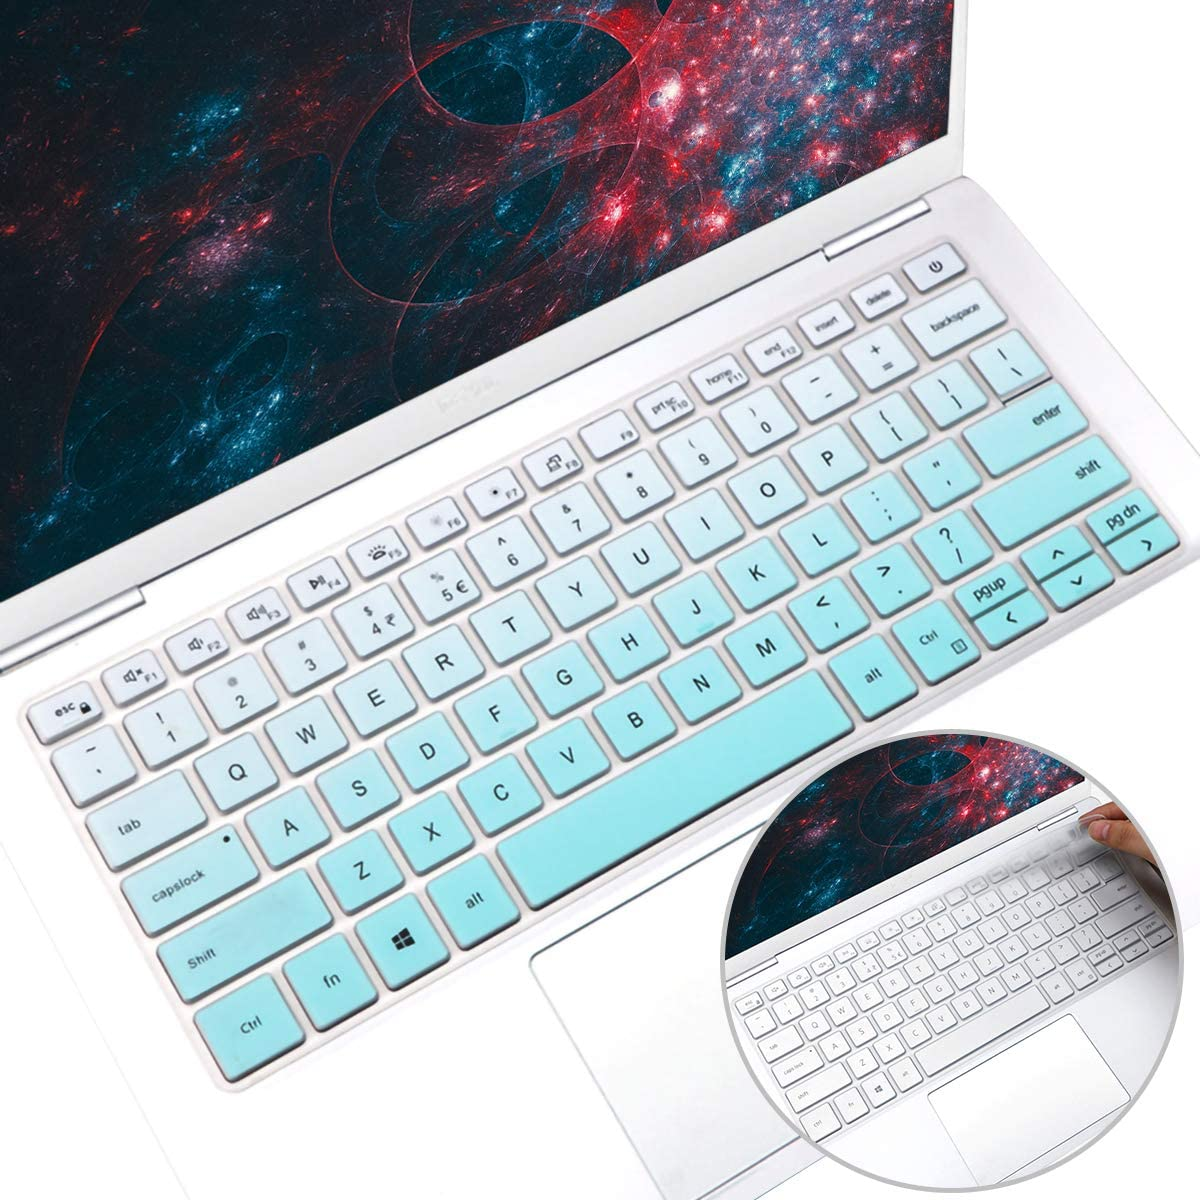 2Pcs i-Tensodo Keyboard Cover for 2020 2019 Dell Inspiron 13 5390 5391 7390 7391 13.3 /Dell Inspiron 14 5490 5493 5498 7490 /Dell Vostro 13 5390 5391 5490 US Layout Keyboard Skin,